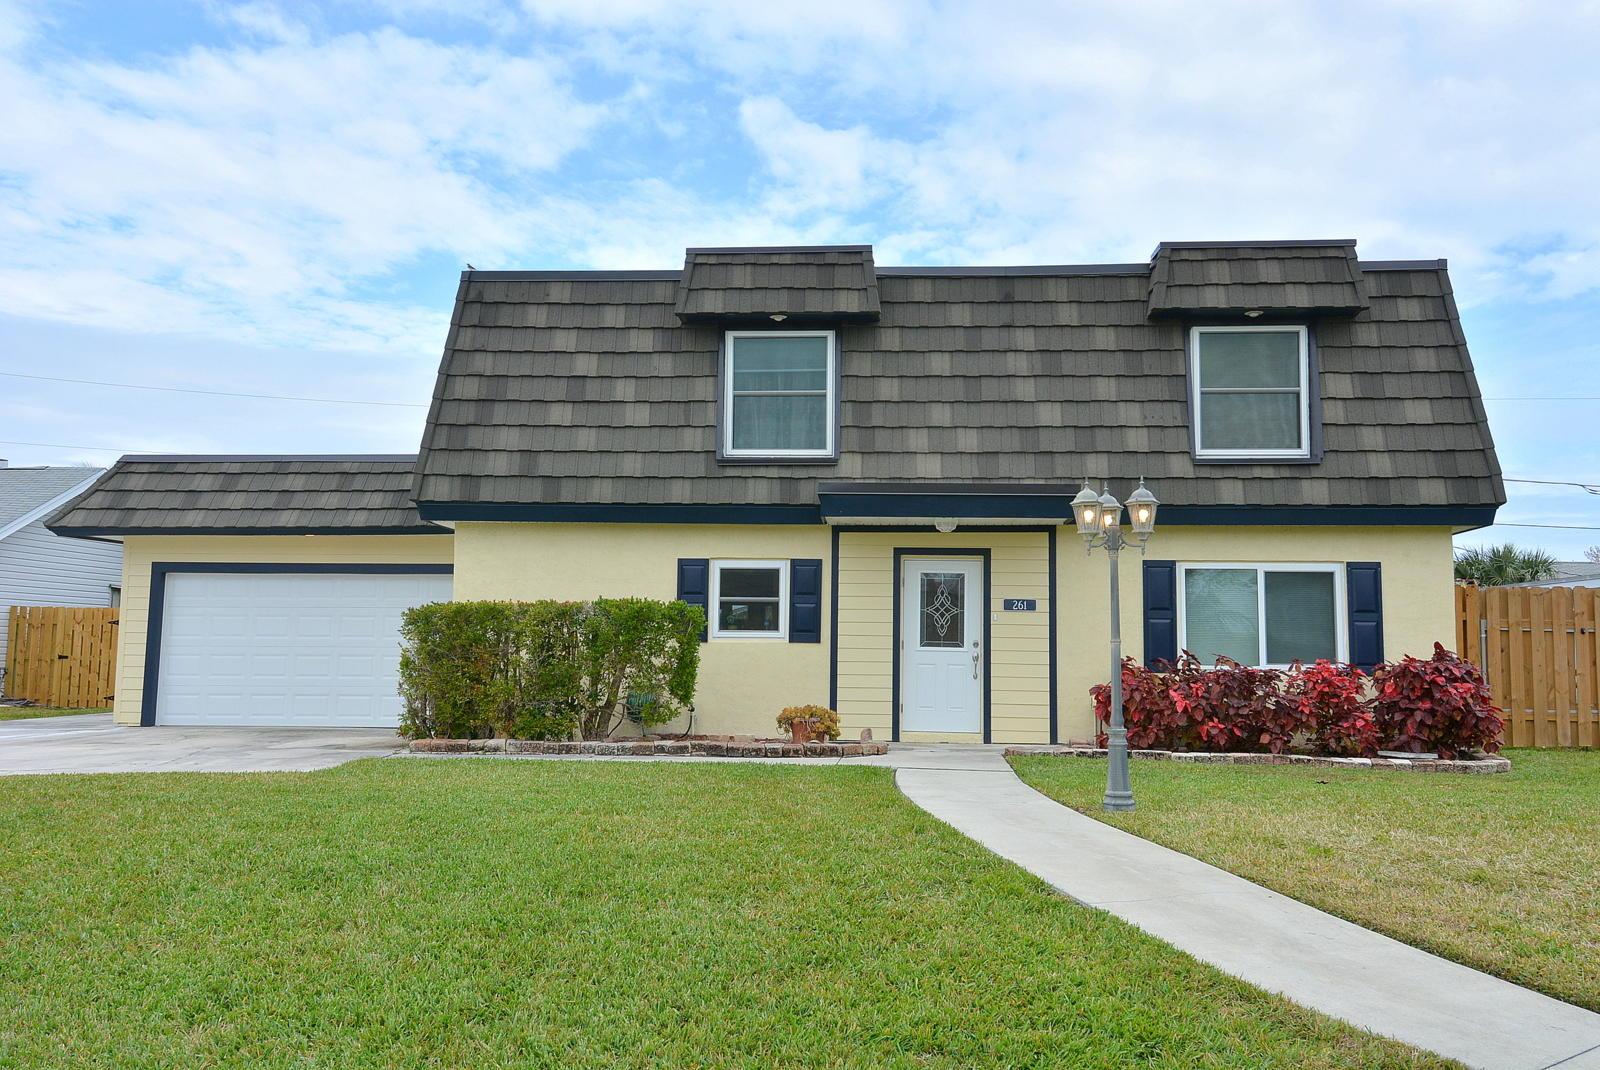 Single Family Home for Sale at 261 SE Villas 261 SE Villas Stuart, Florida 34994 United States